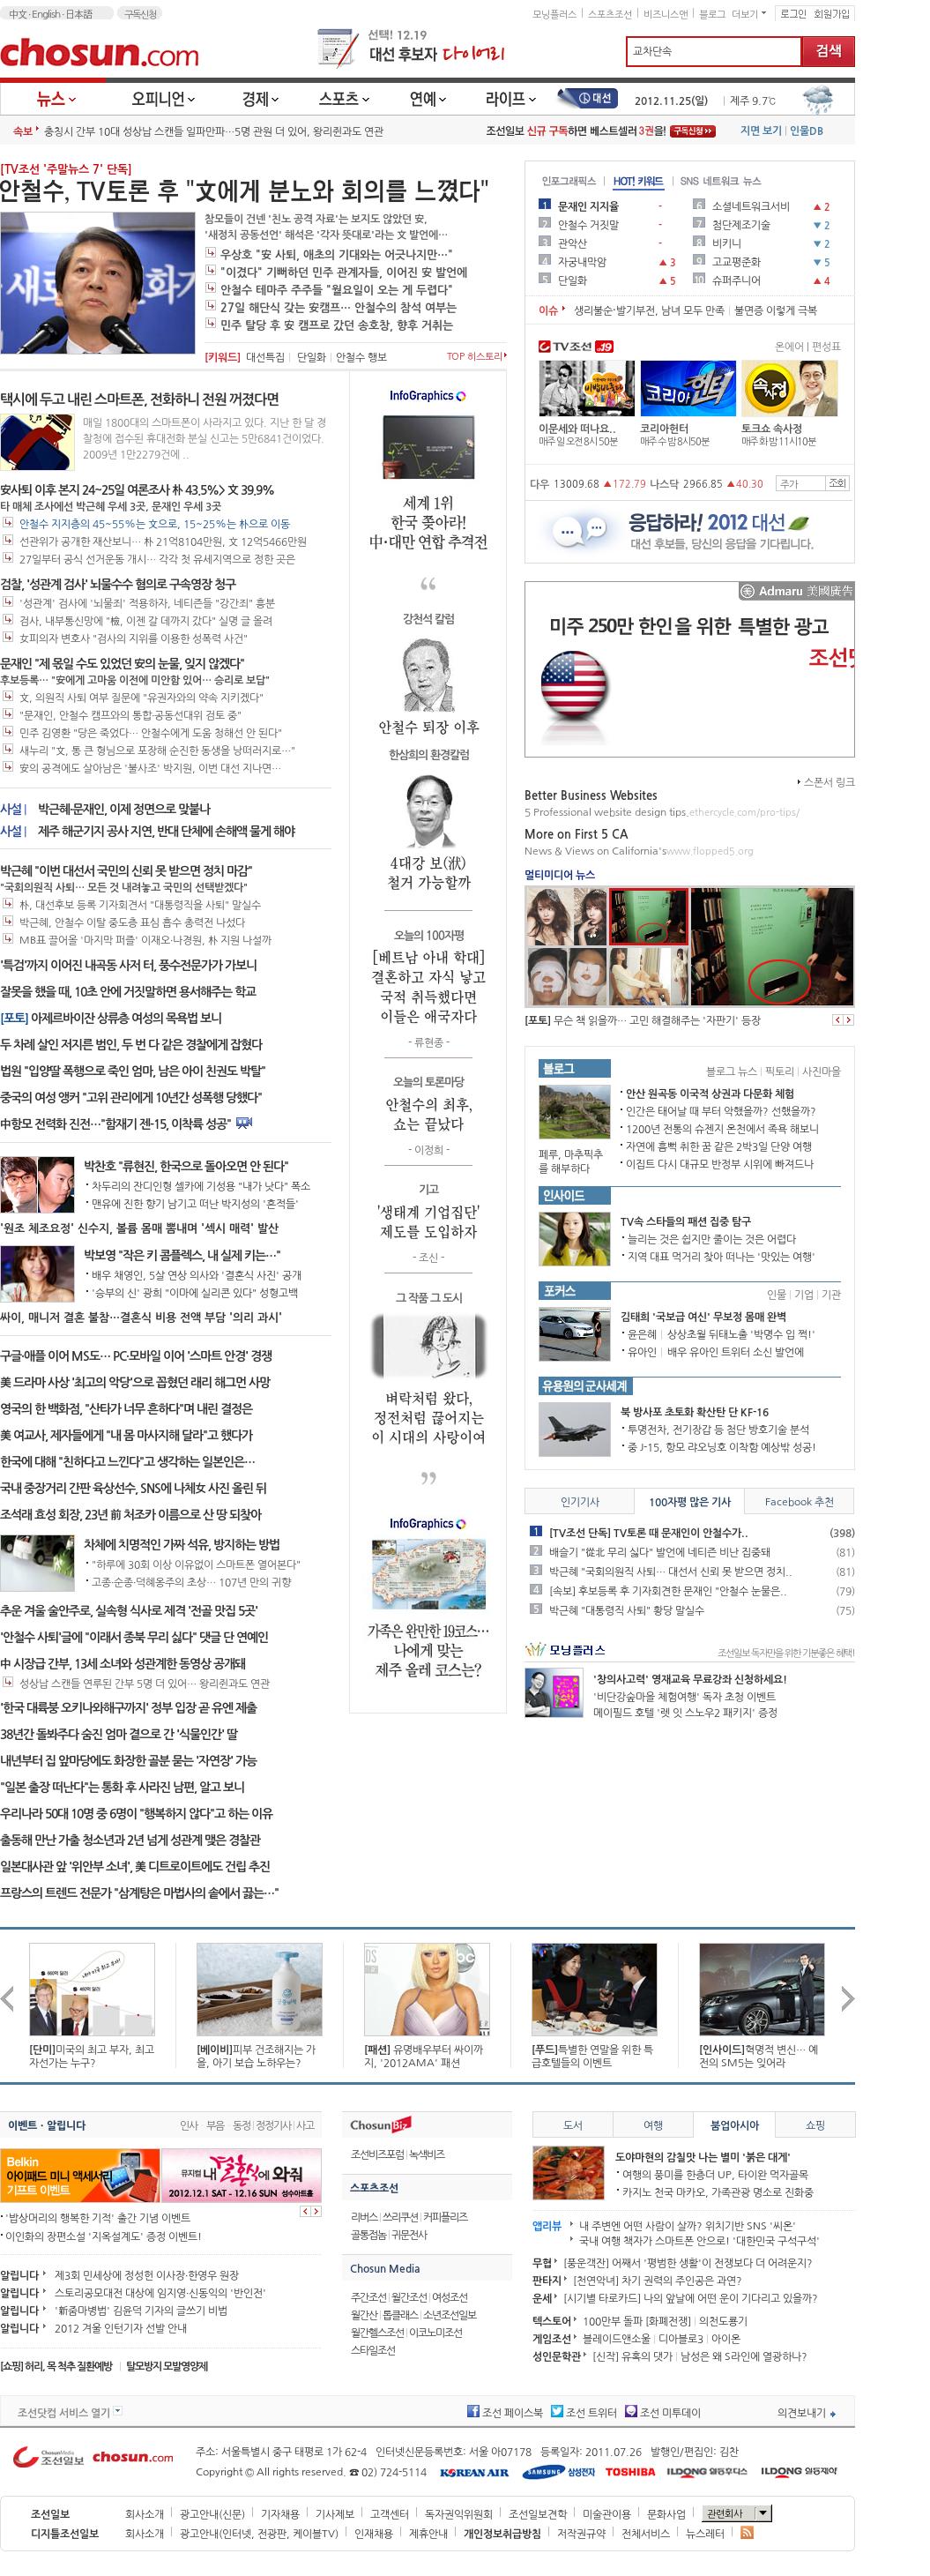 chosun.com at Sunday Nov. 25, 2012, 2:05 p.m. UTC